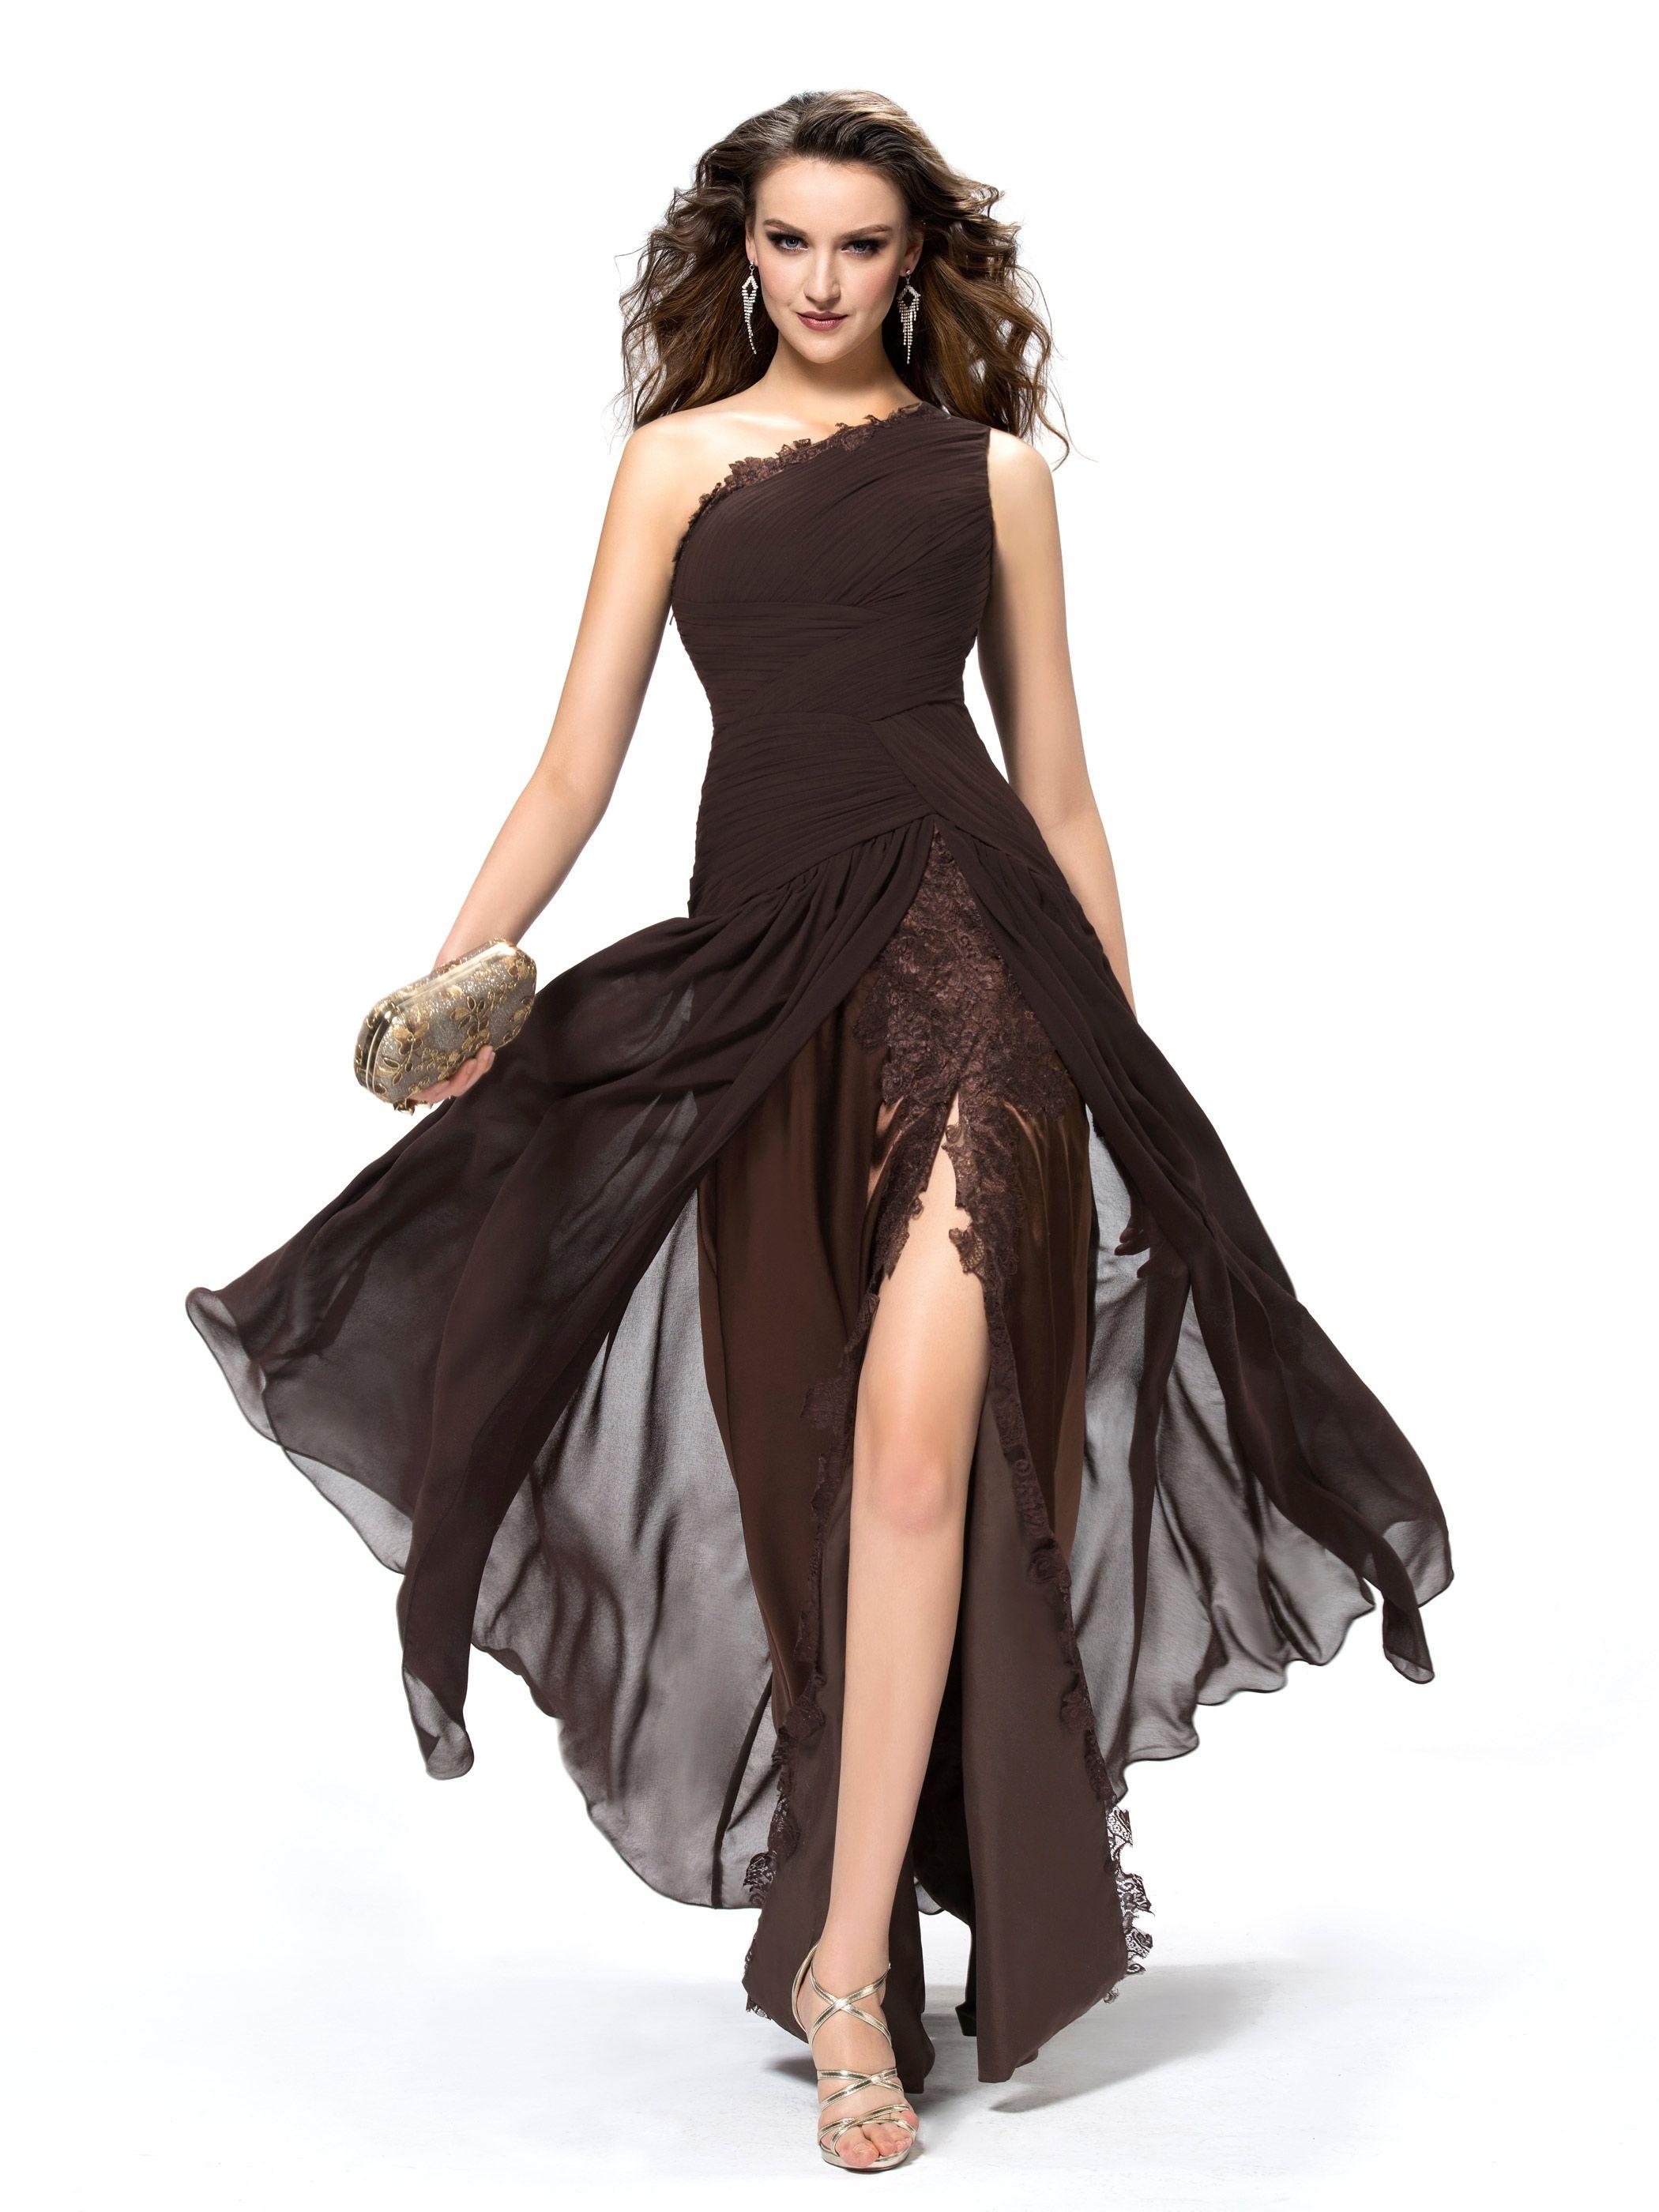 chicmall.de lieferungenEvening Floor-Length A-line One Shoulder Summer All Sizes Brown Pleats Dress Lange Abendkleider